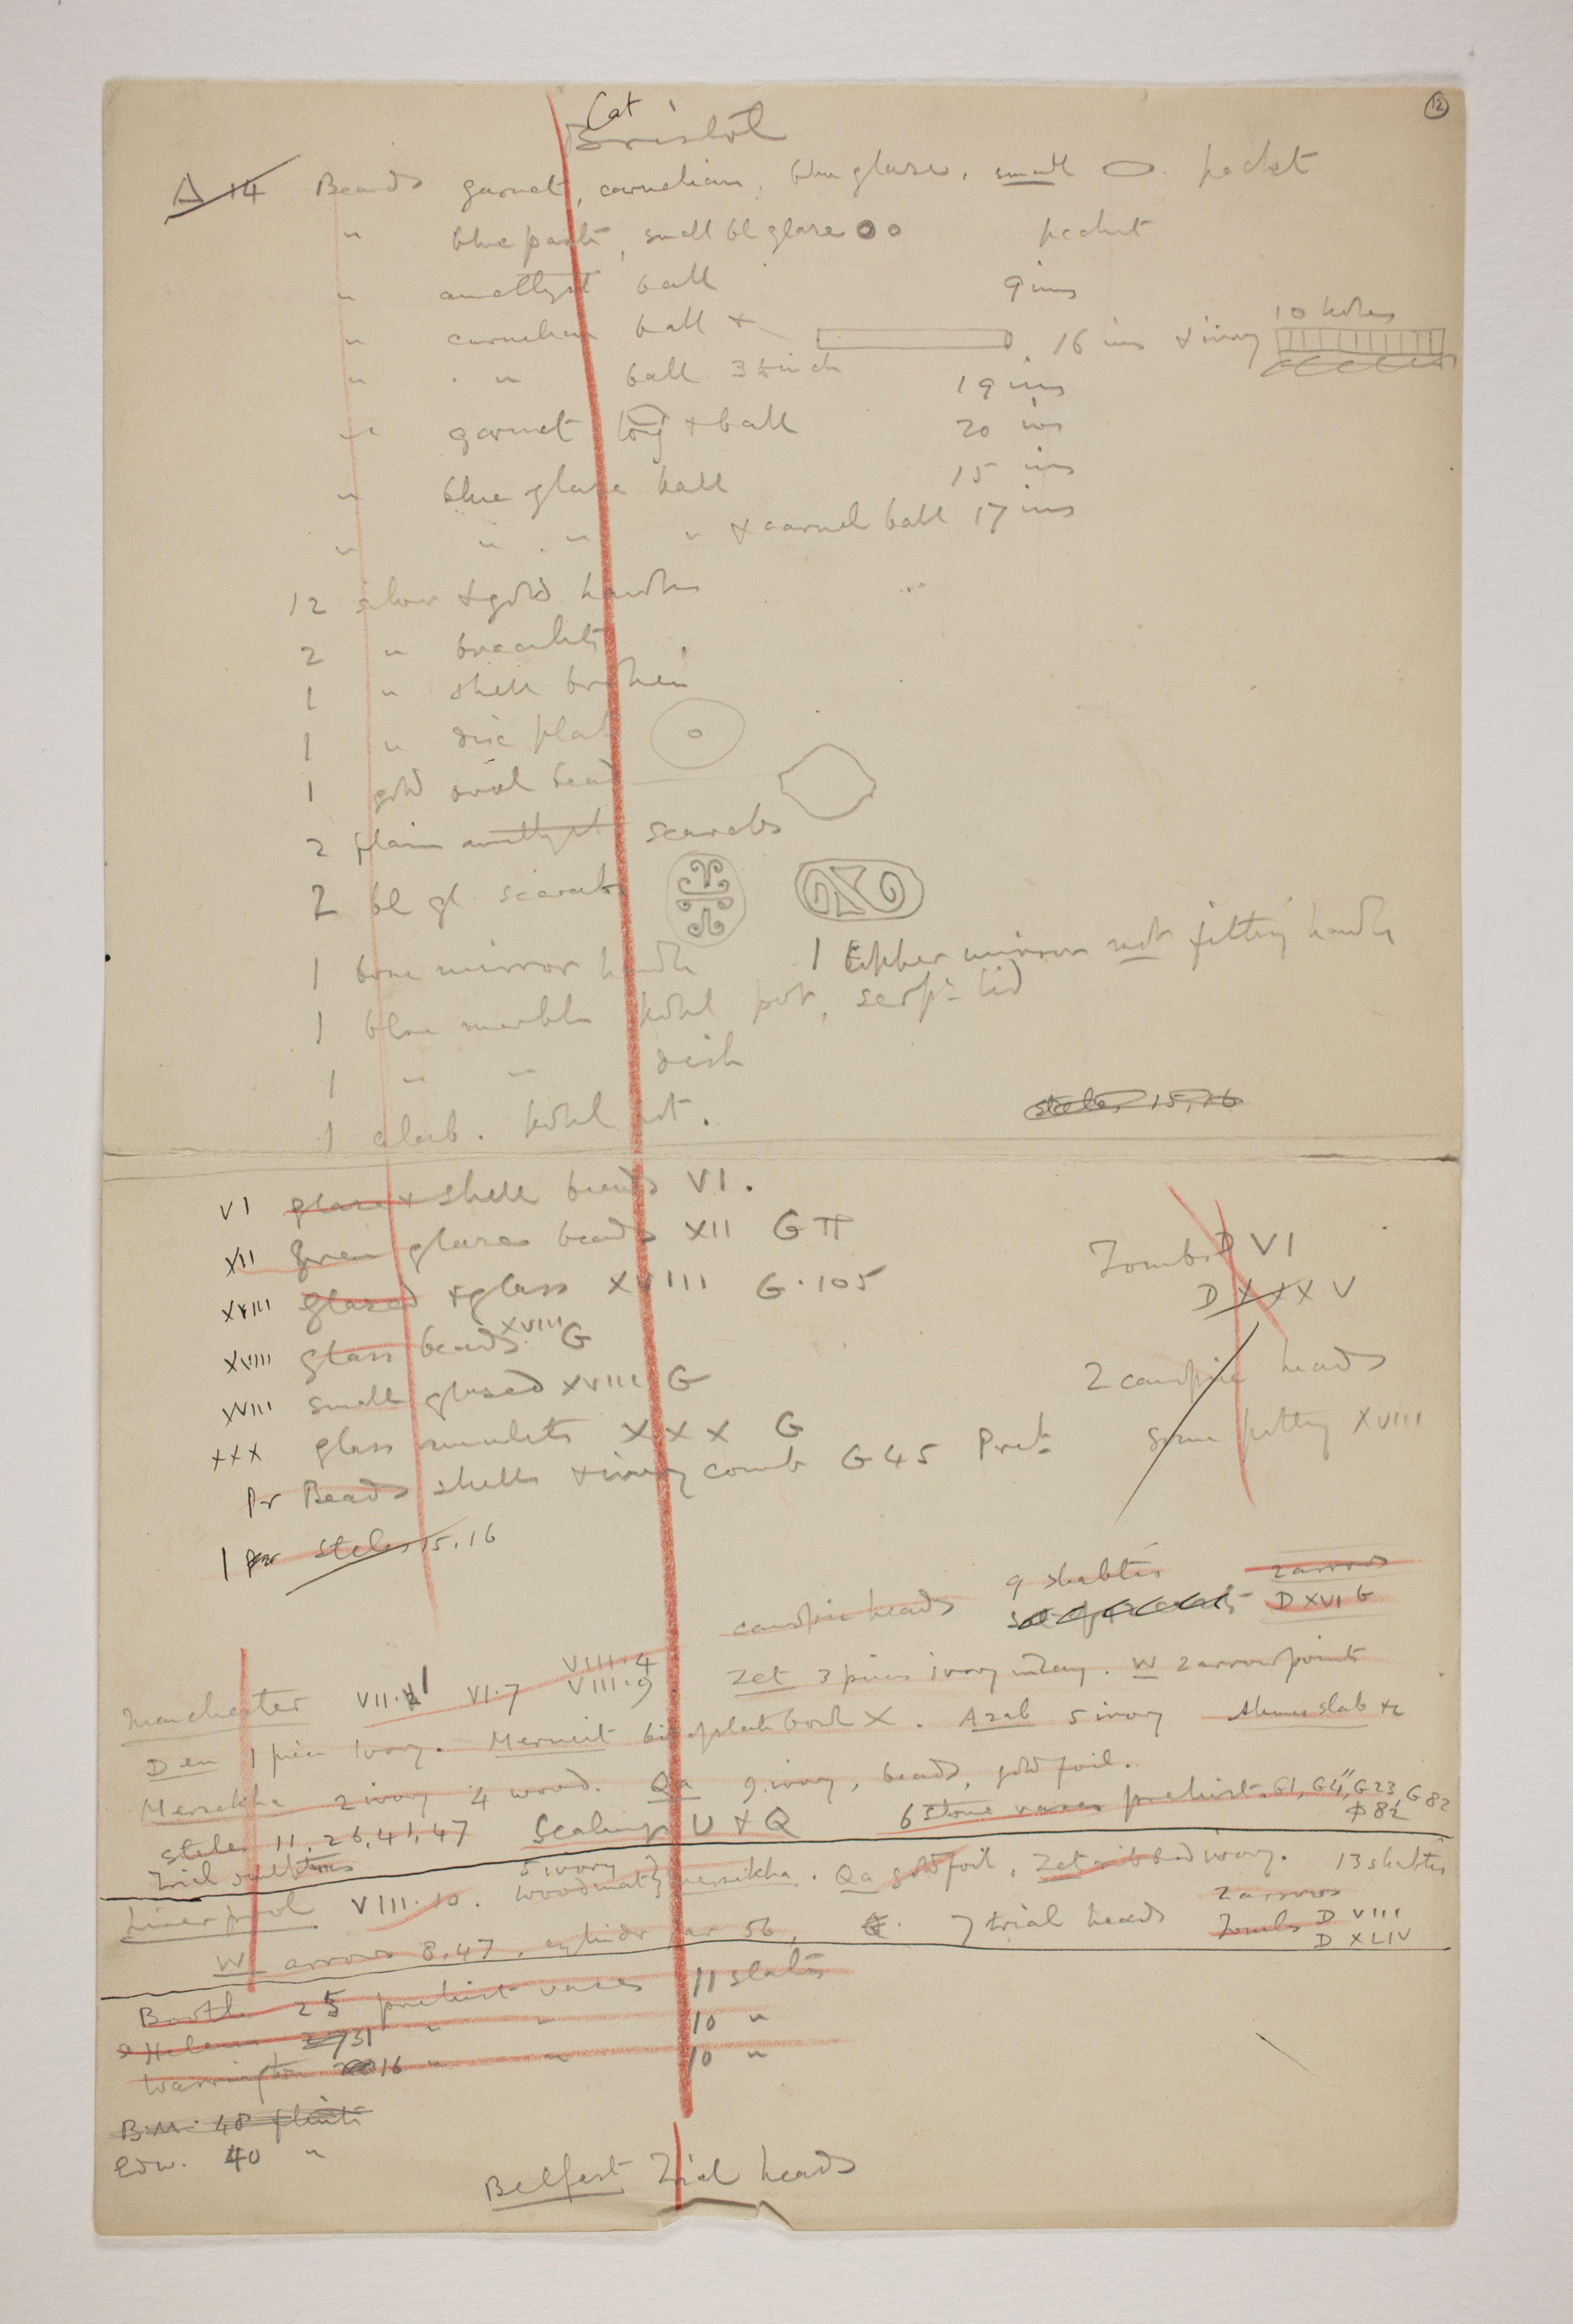 1899-1900 Abydos Multiple institution list PMA/WFP1/D/8/11.1